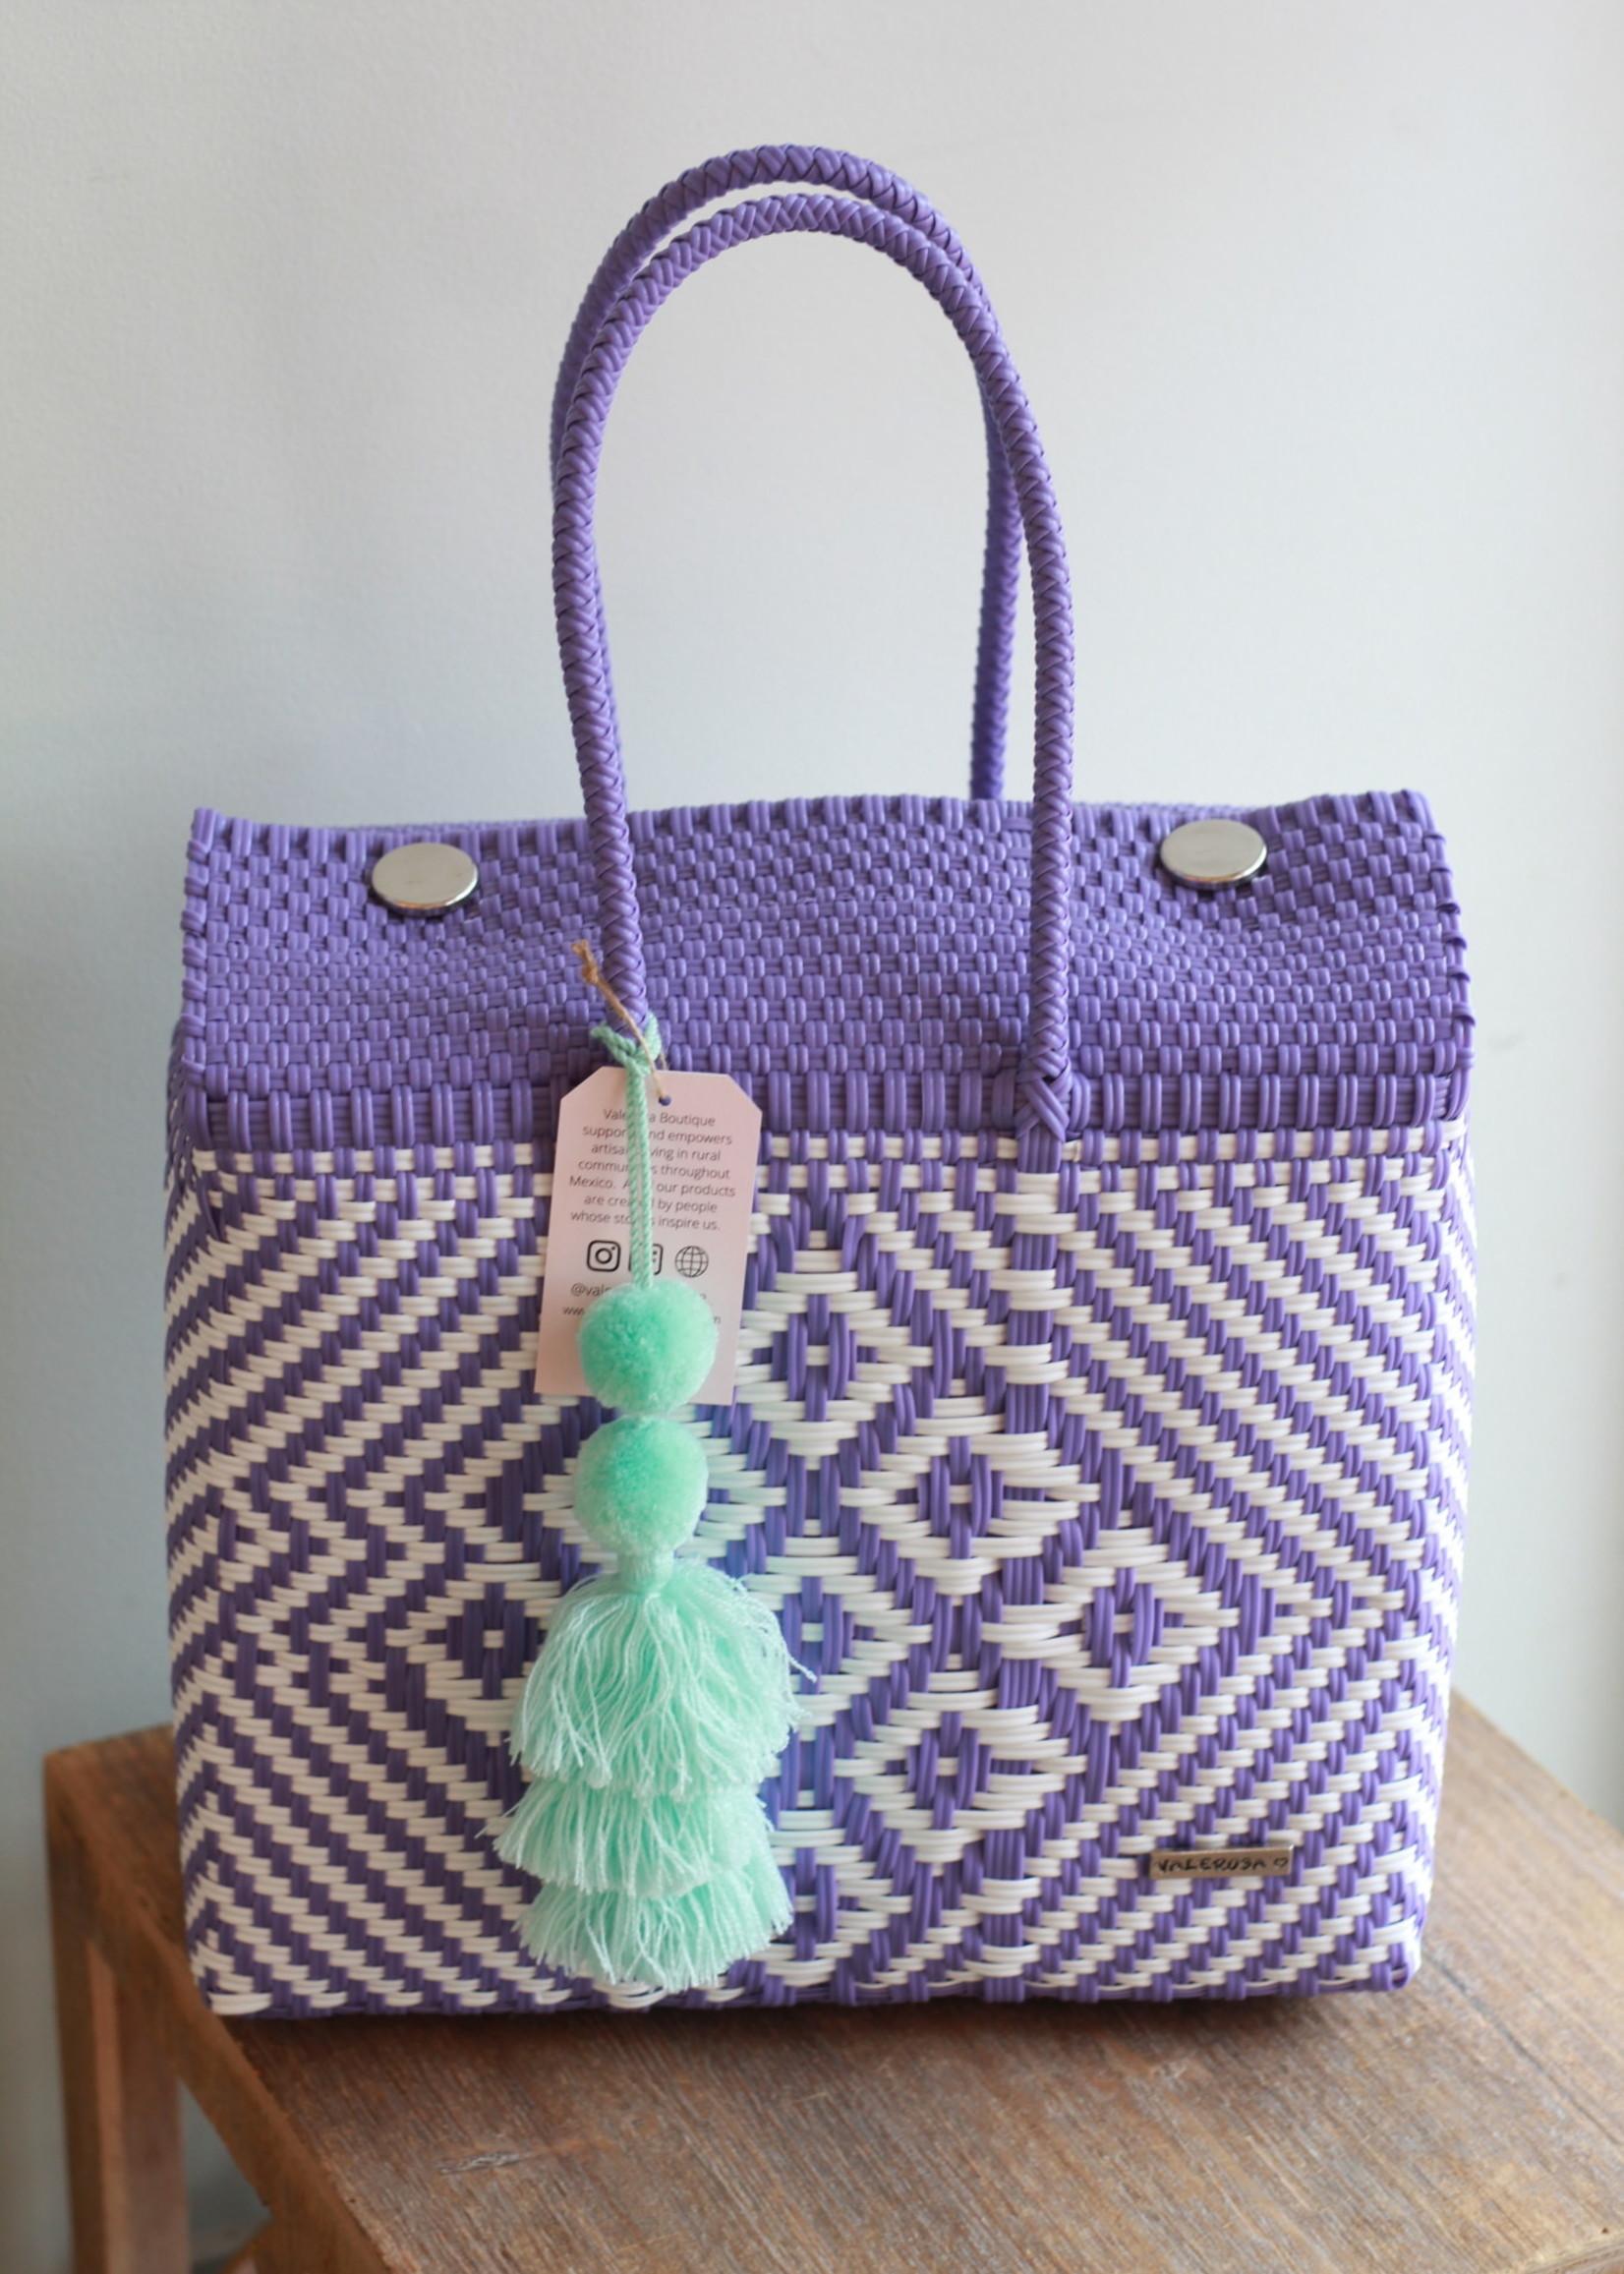 Valerosa Boutique Valerosa Purple Dia Purse With Aqua Tassel